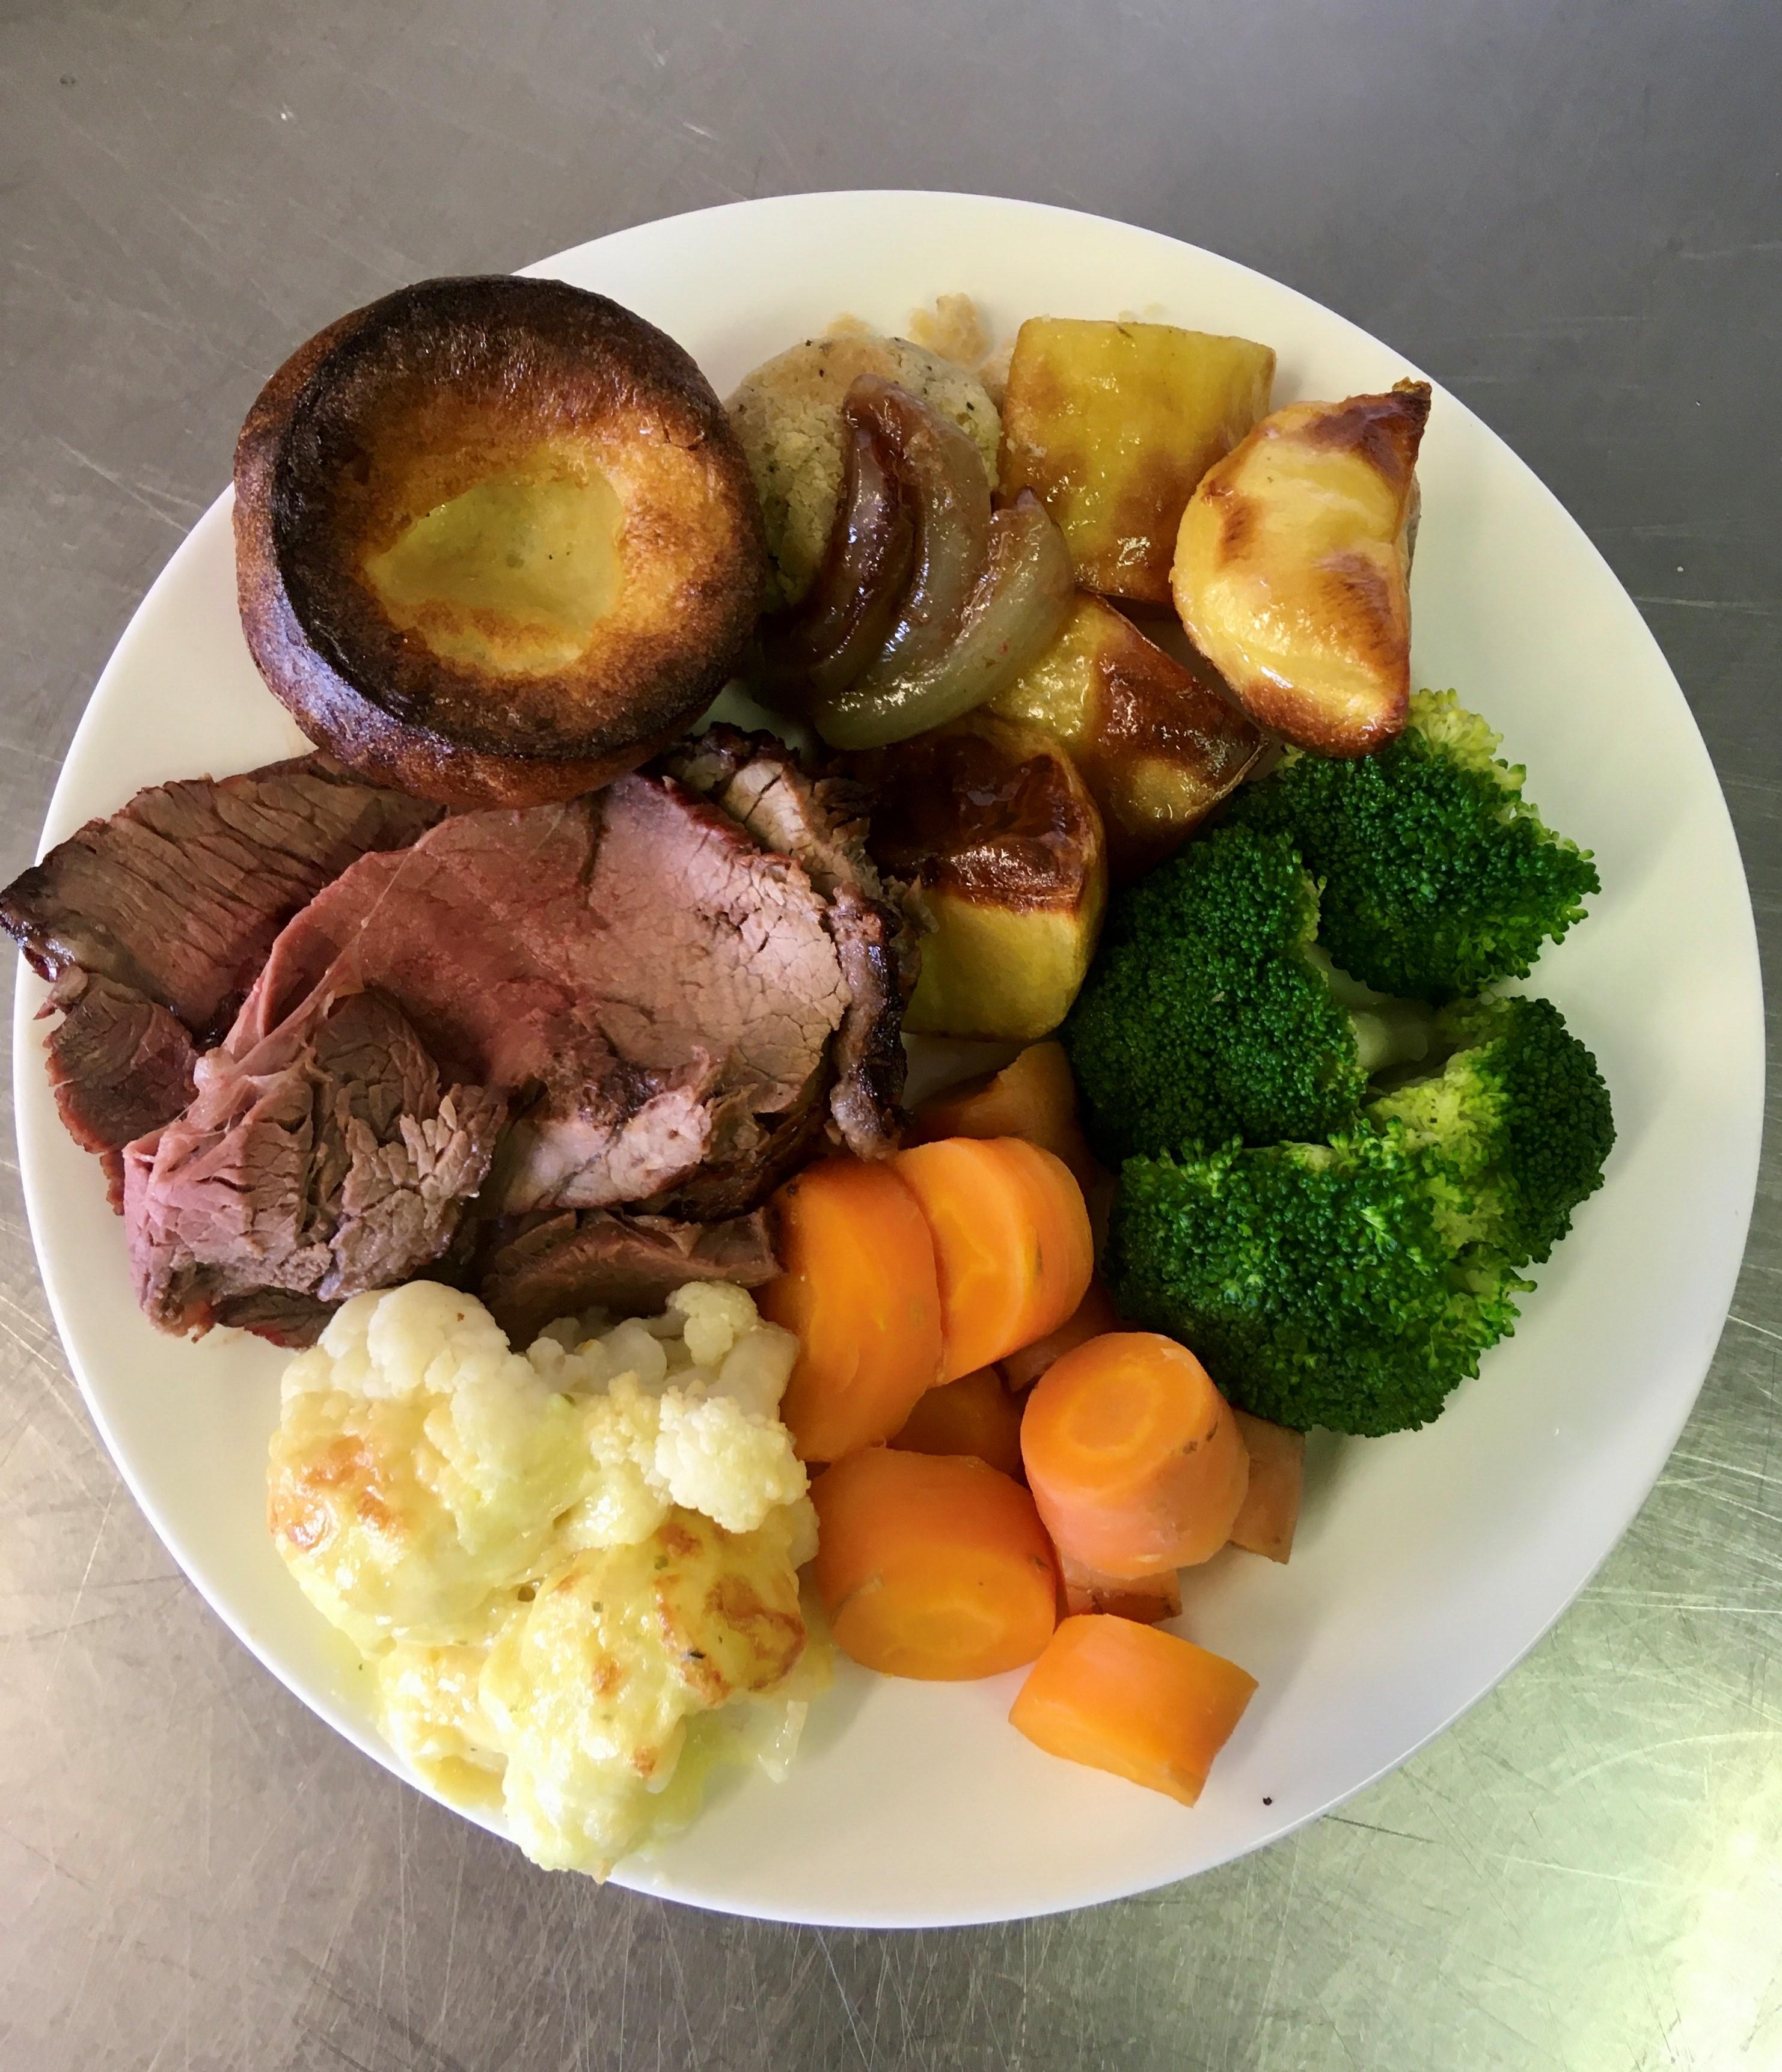 Roast Dinners Takeaway, Salisbury Football Club